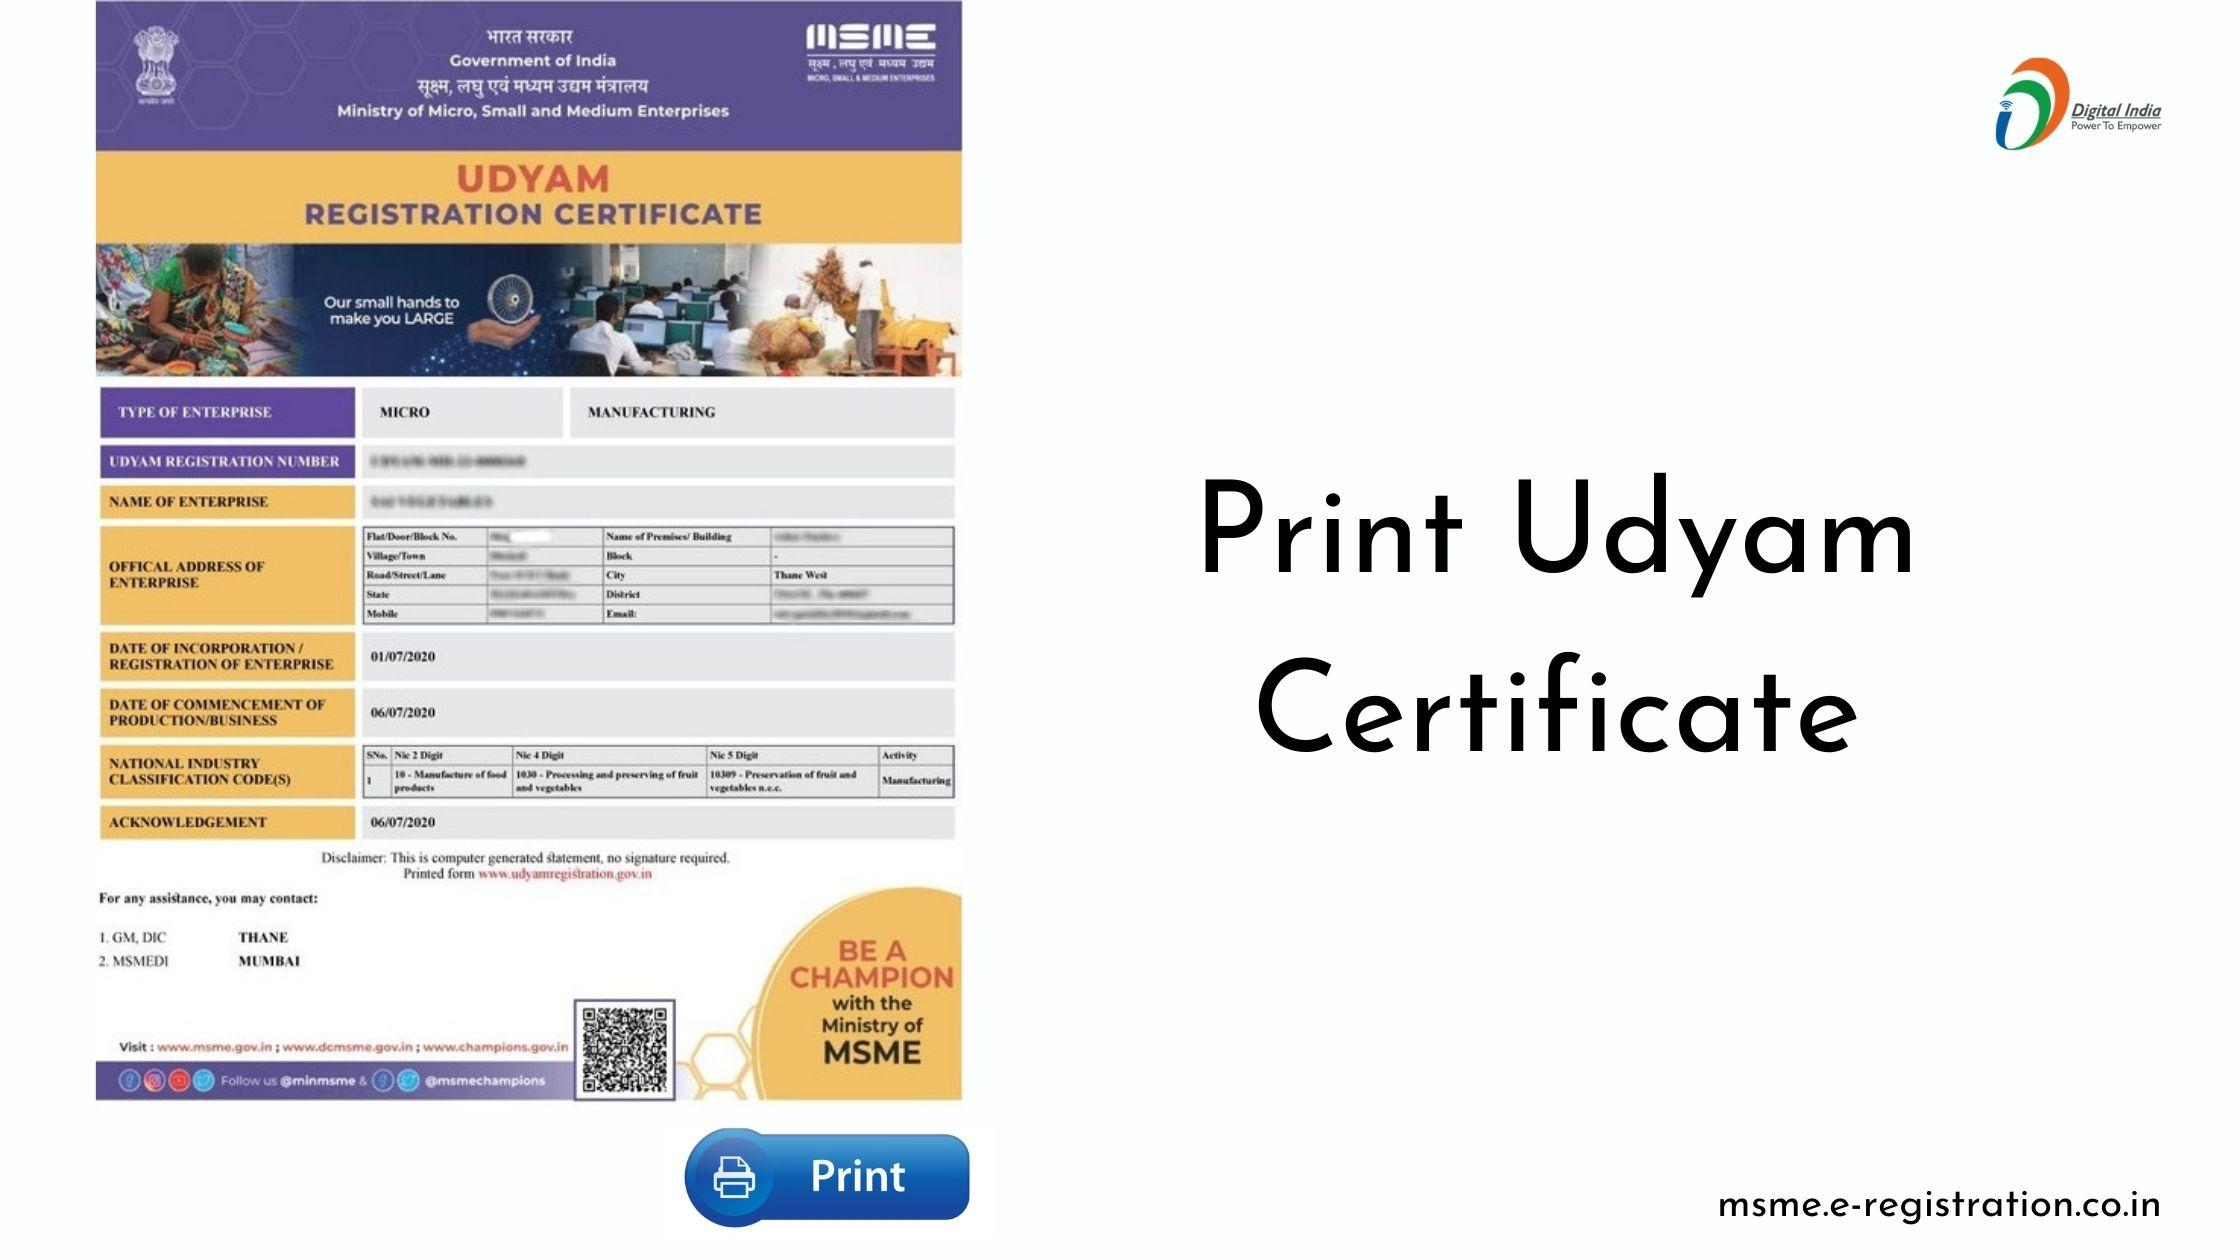 Print Udyam Certificate